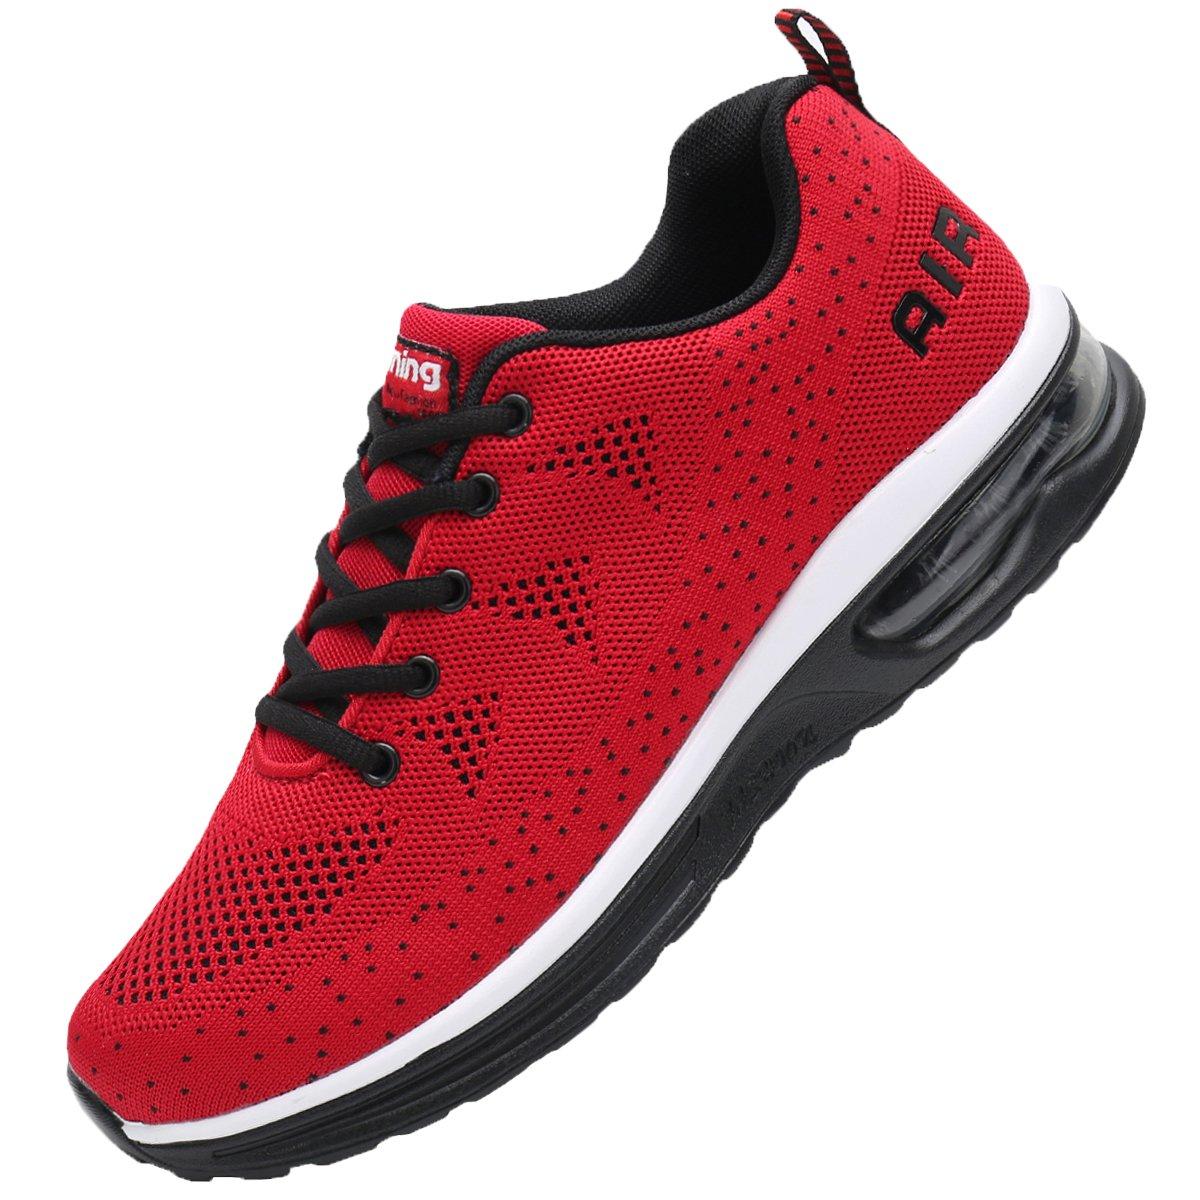 JARLIF Men's Lightweight Athletic Running Shoes Breathable Sport Air Fitness Gym Jogging Sneakers US6.5-12 JARLIF-835-men-shoes01